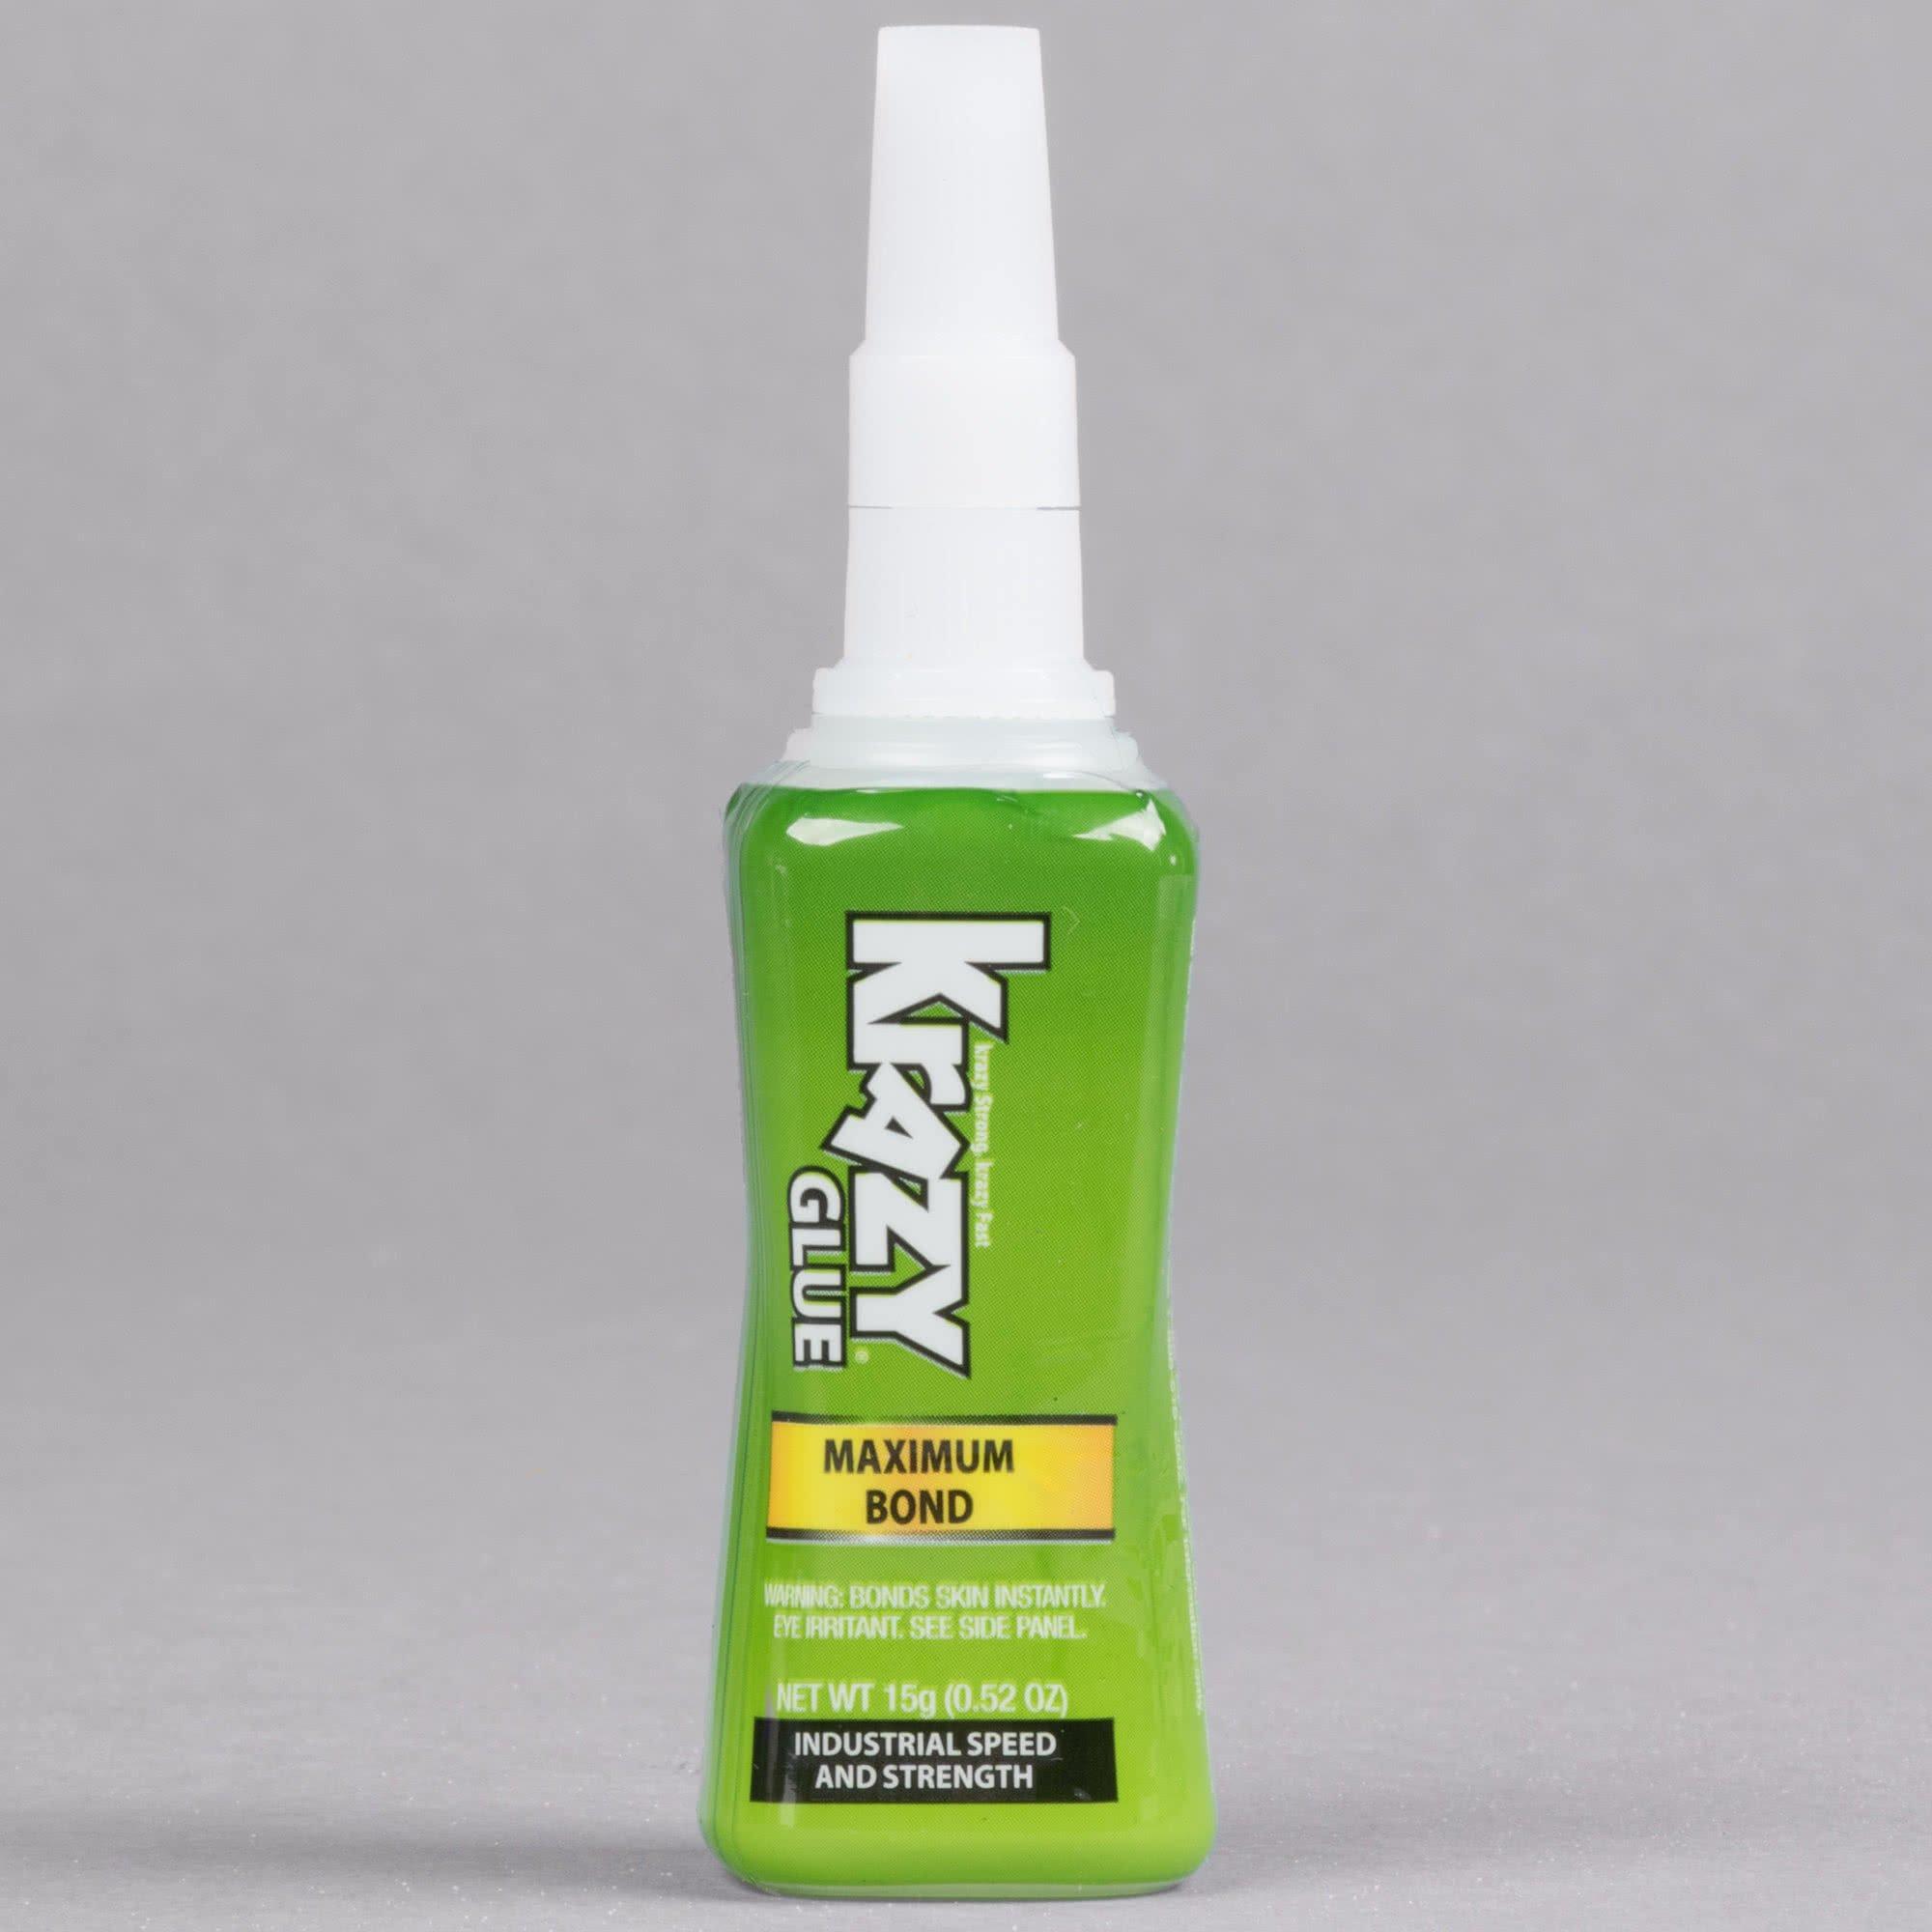 TableTop King KG48948MR Maximum Bond Stay Fresh Clear 15 Gram Glue